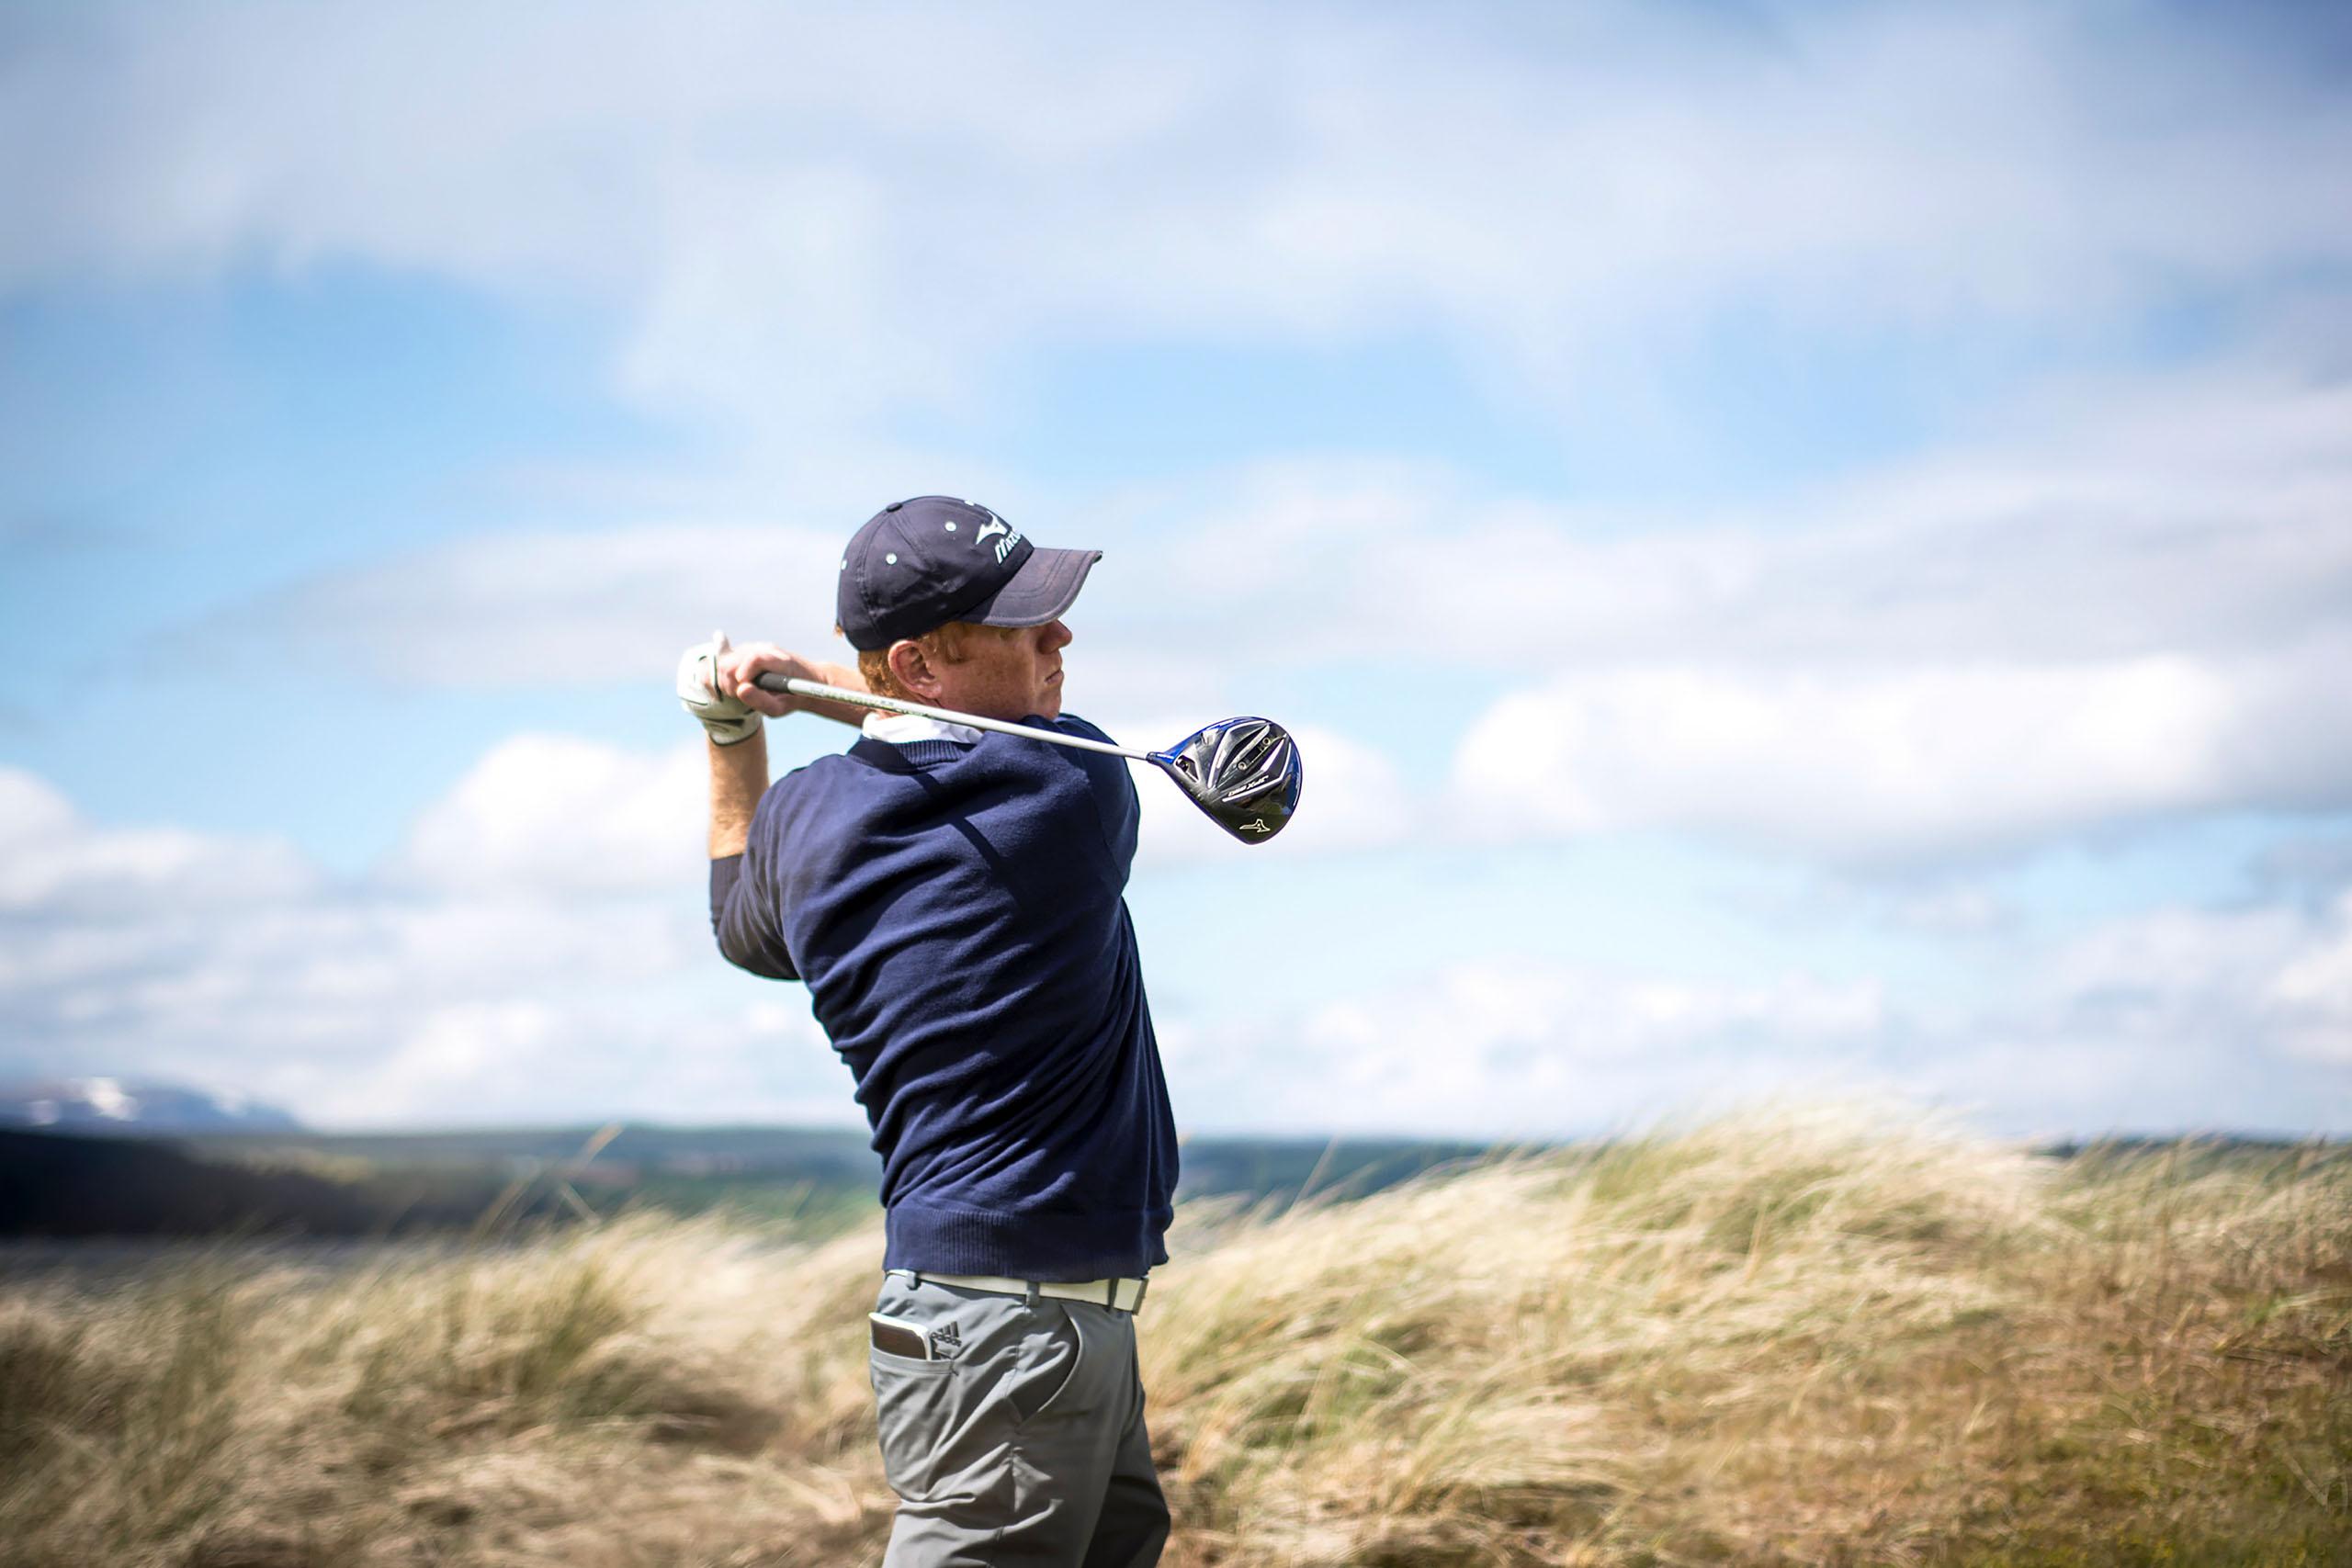 Tom Coyne Swinging a club. Photo Courtesy of Tom Coyne.